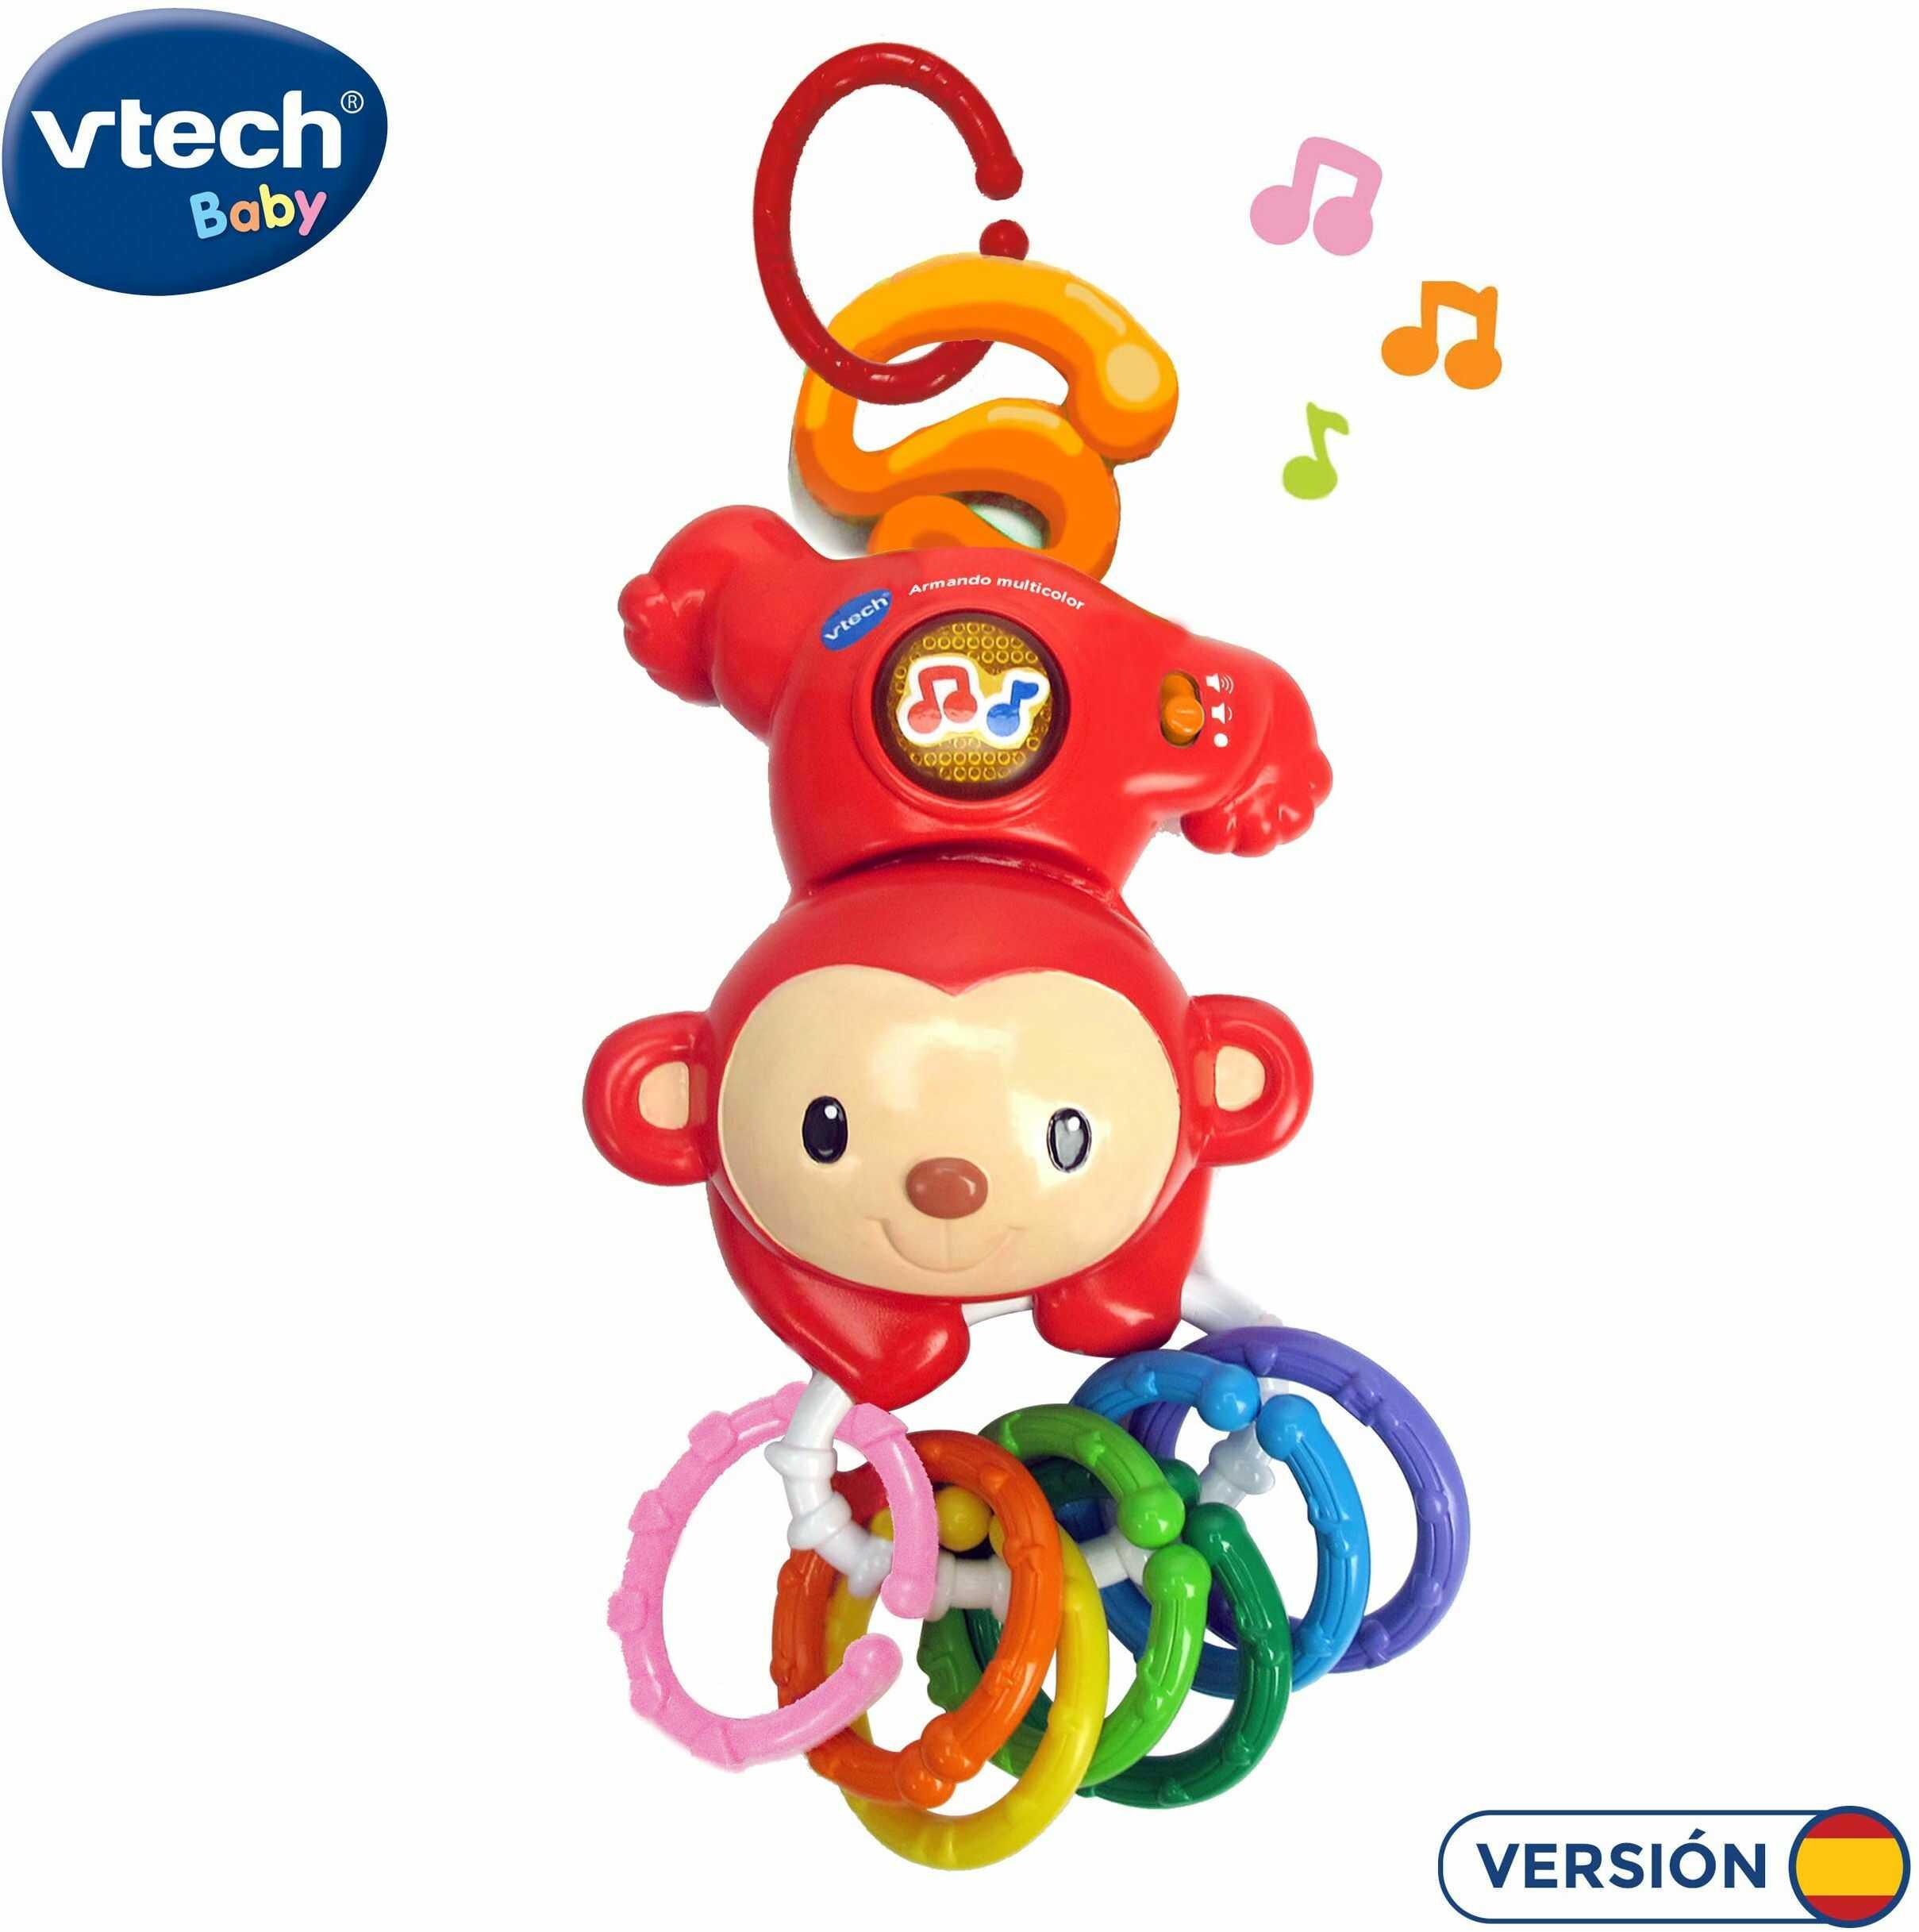 VTech Baby - Armando (3480-185522)